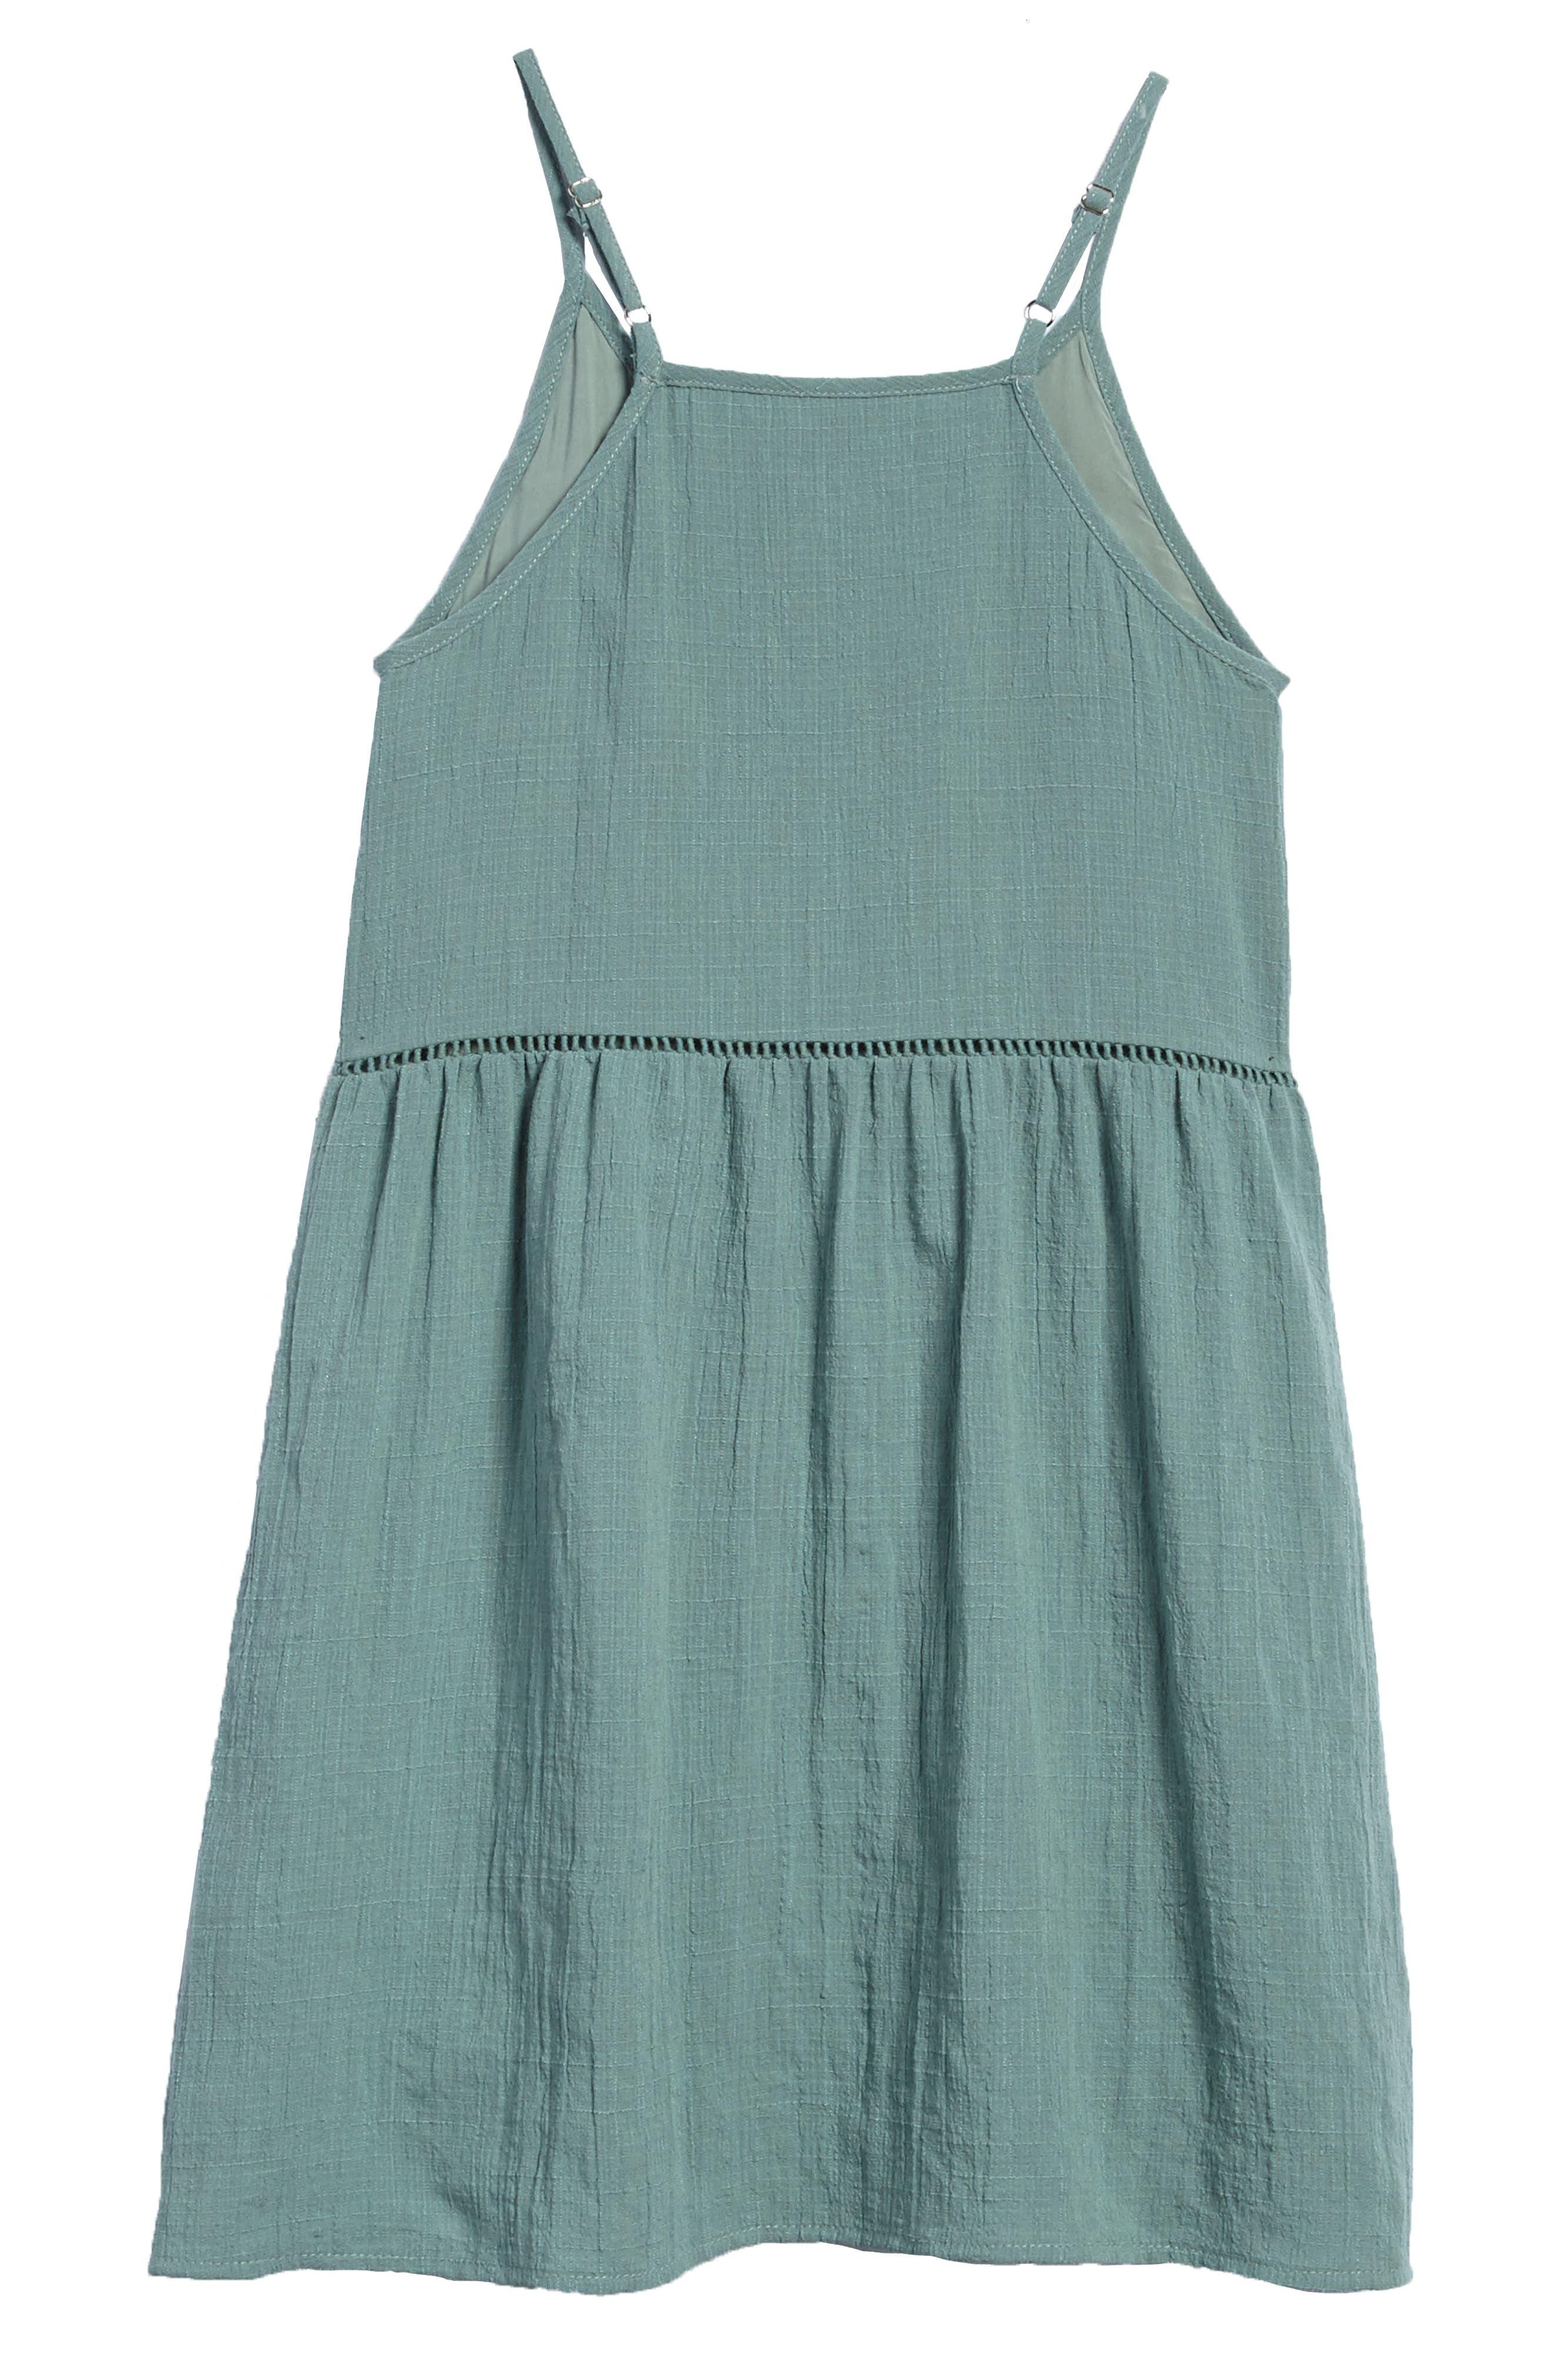 For All Season Woven Tank Dress,                             Alternate thumbnail 2, color,                             300